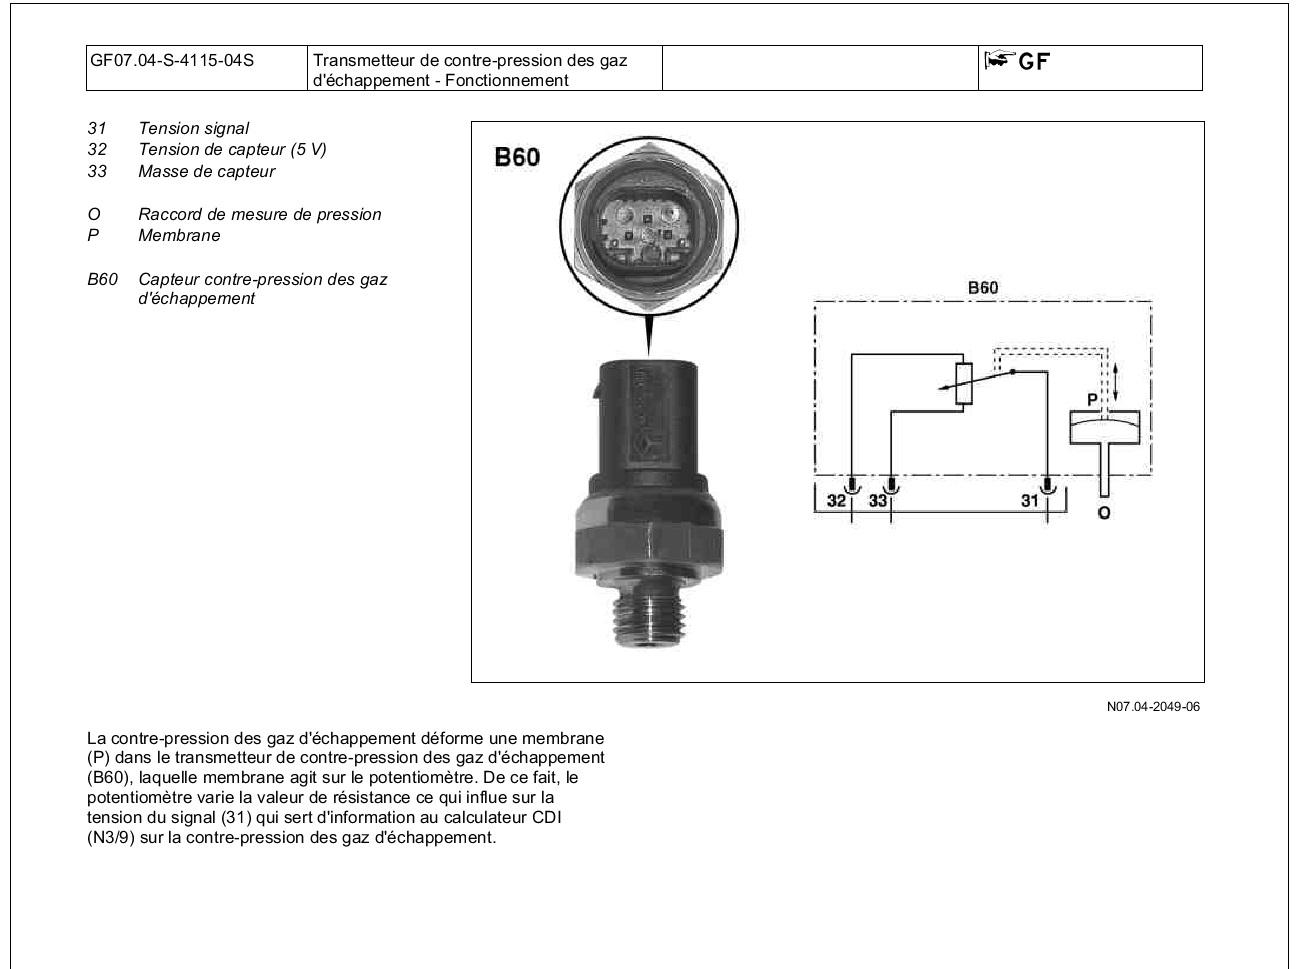 capteur-contrepression-5-WDF63960113087425.jpg